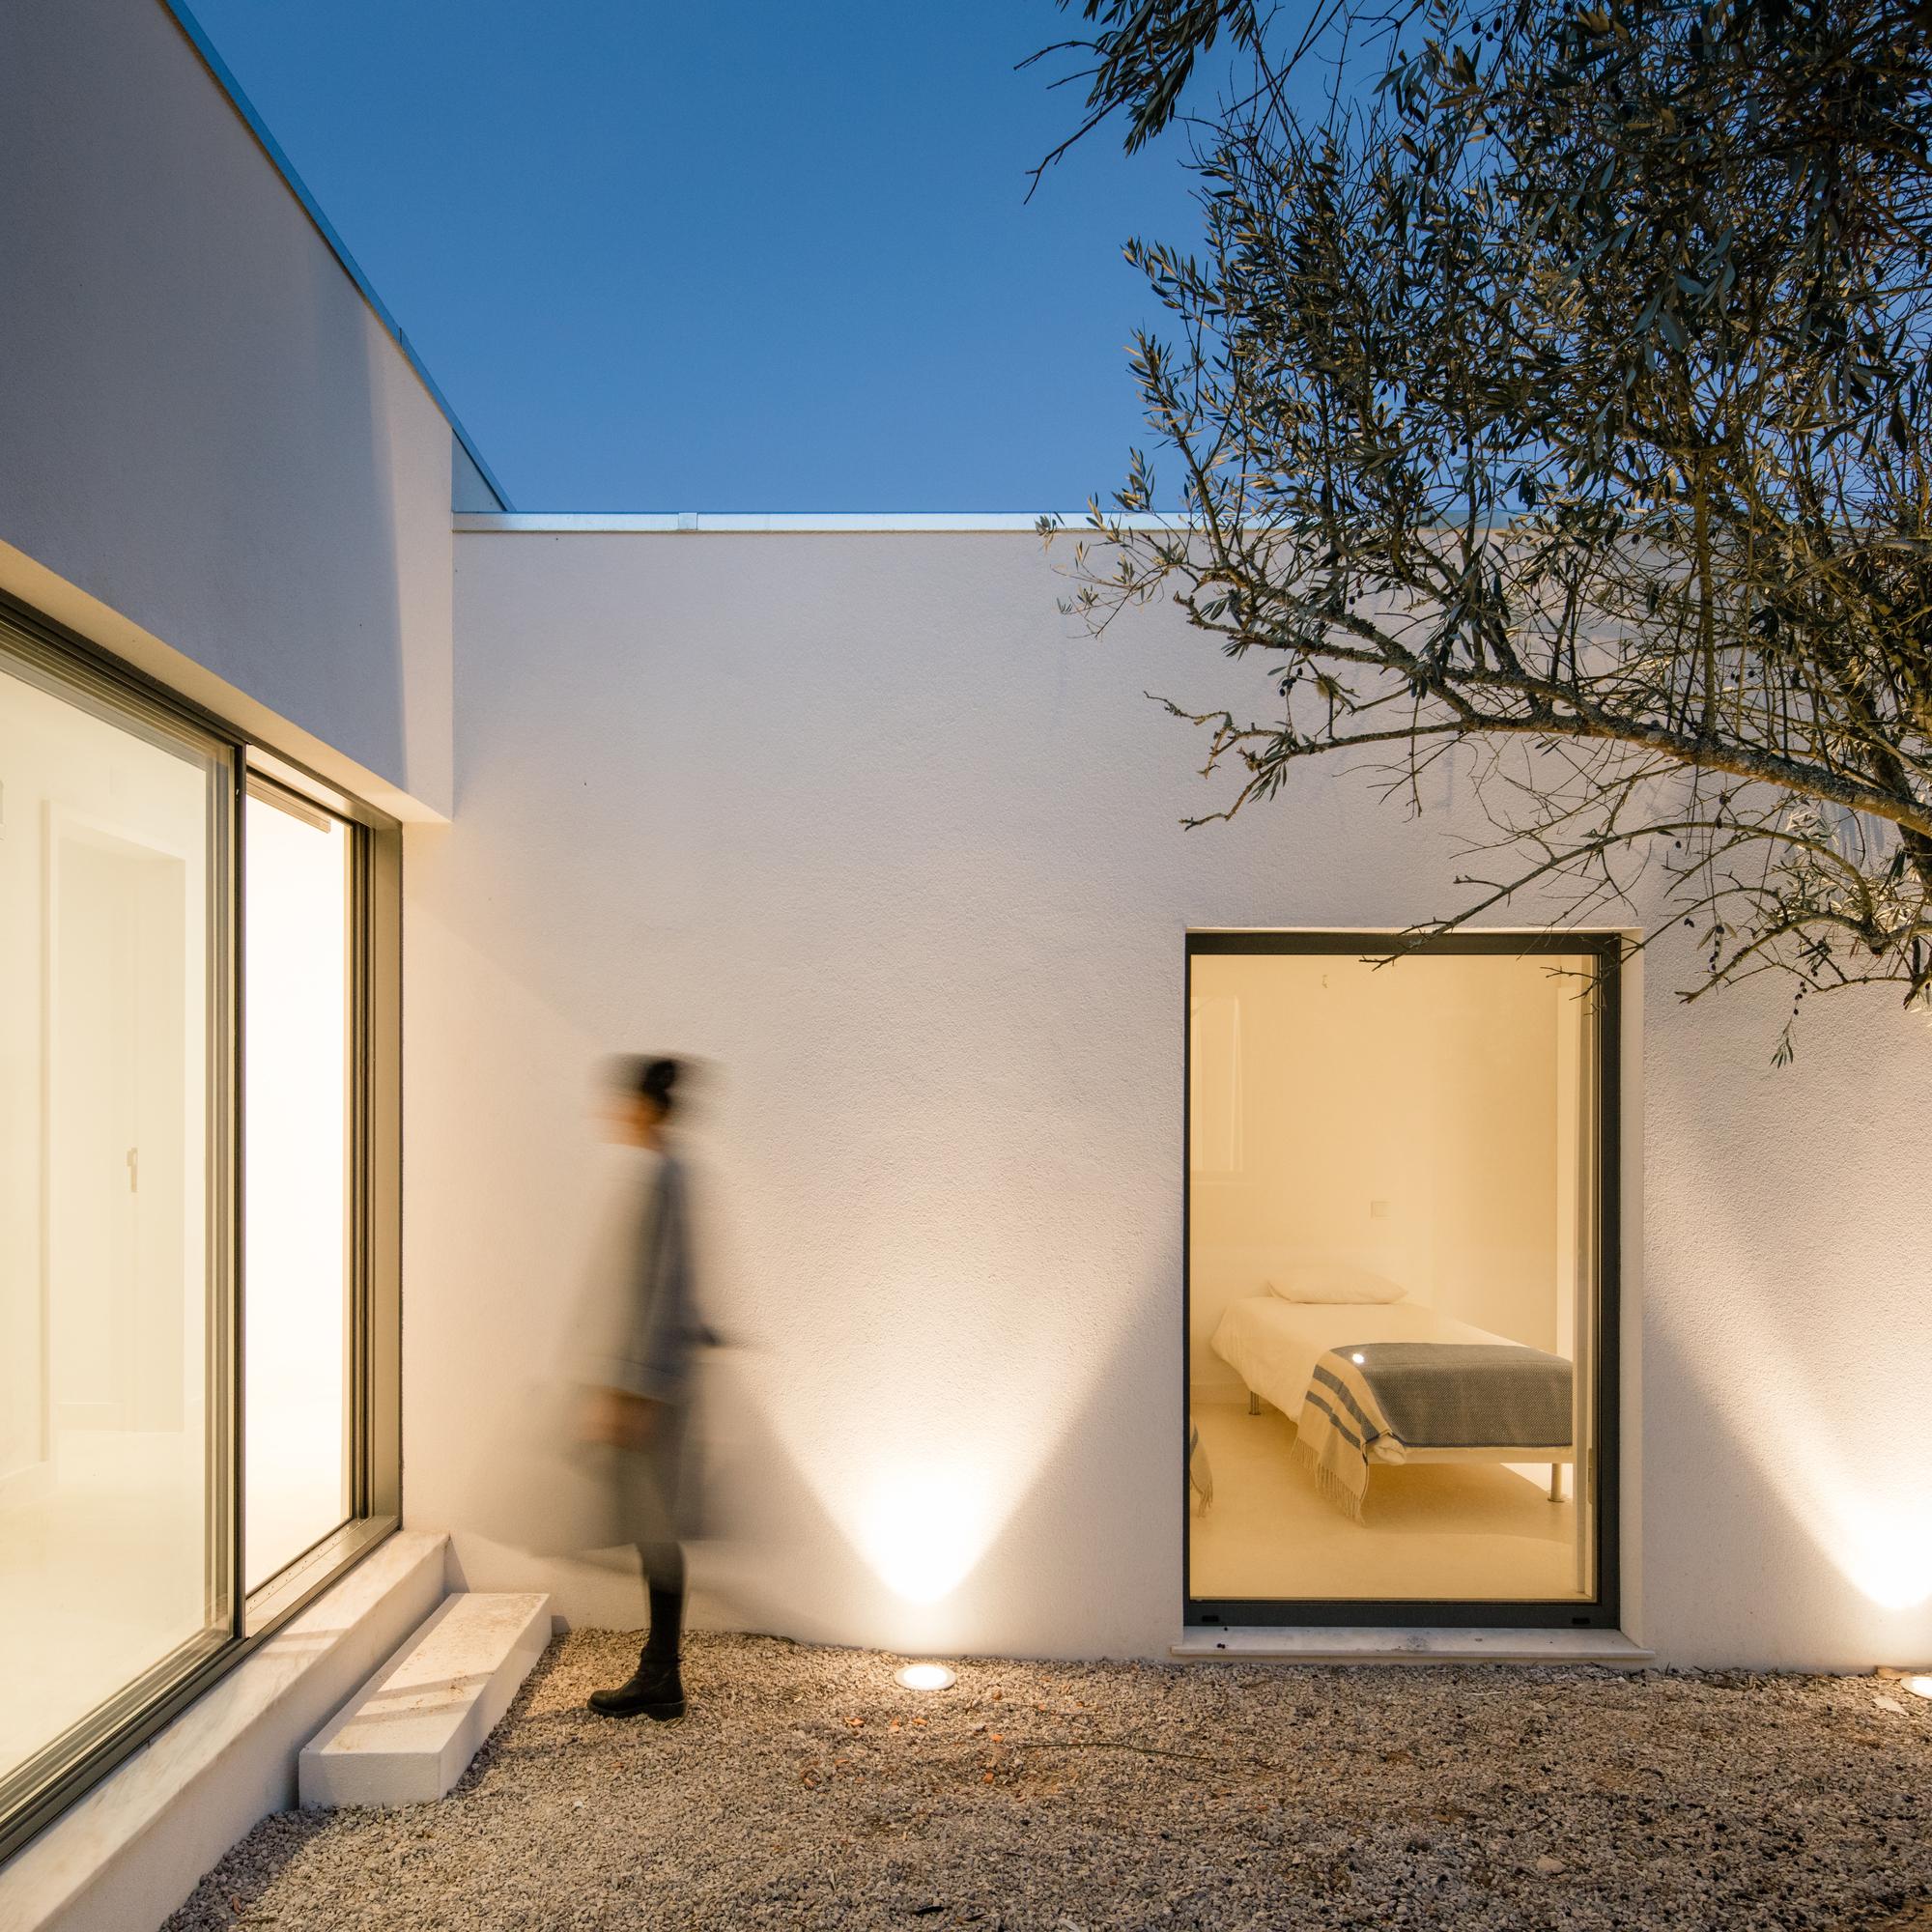 Galeria de resid ncia vinhedo blaanc 3 for Minimalistic house escape 3